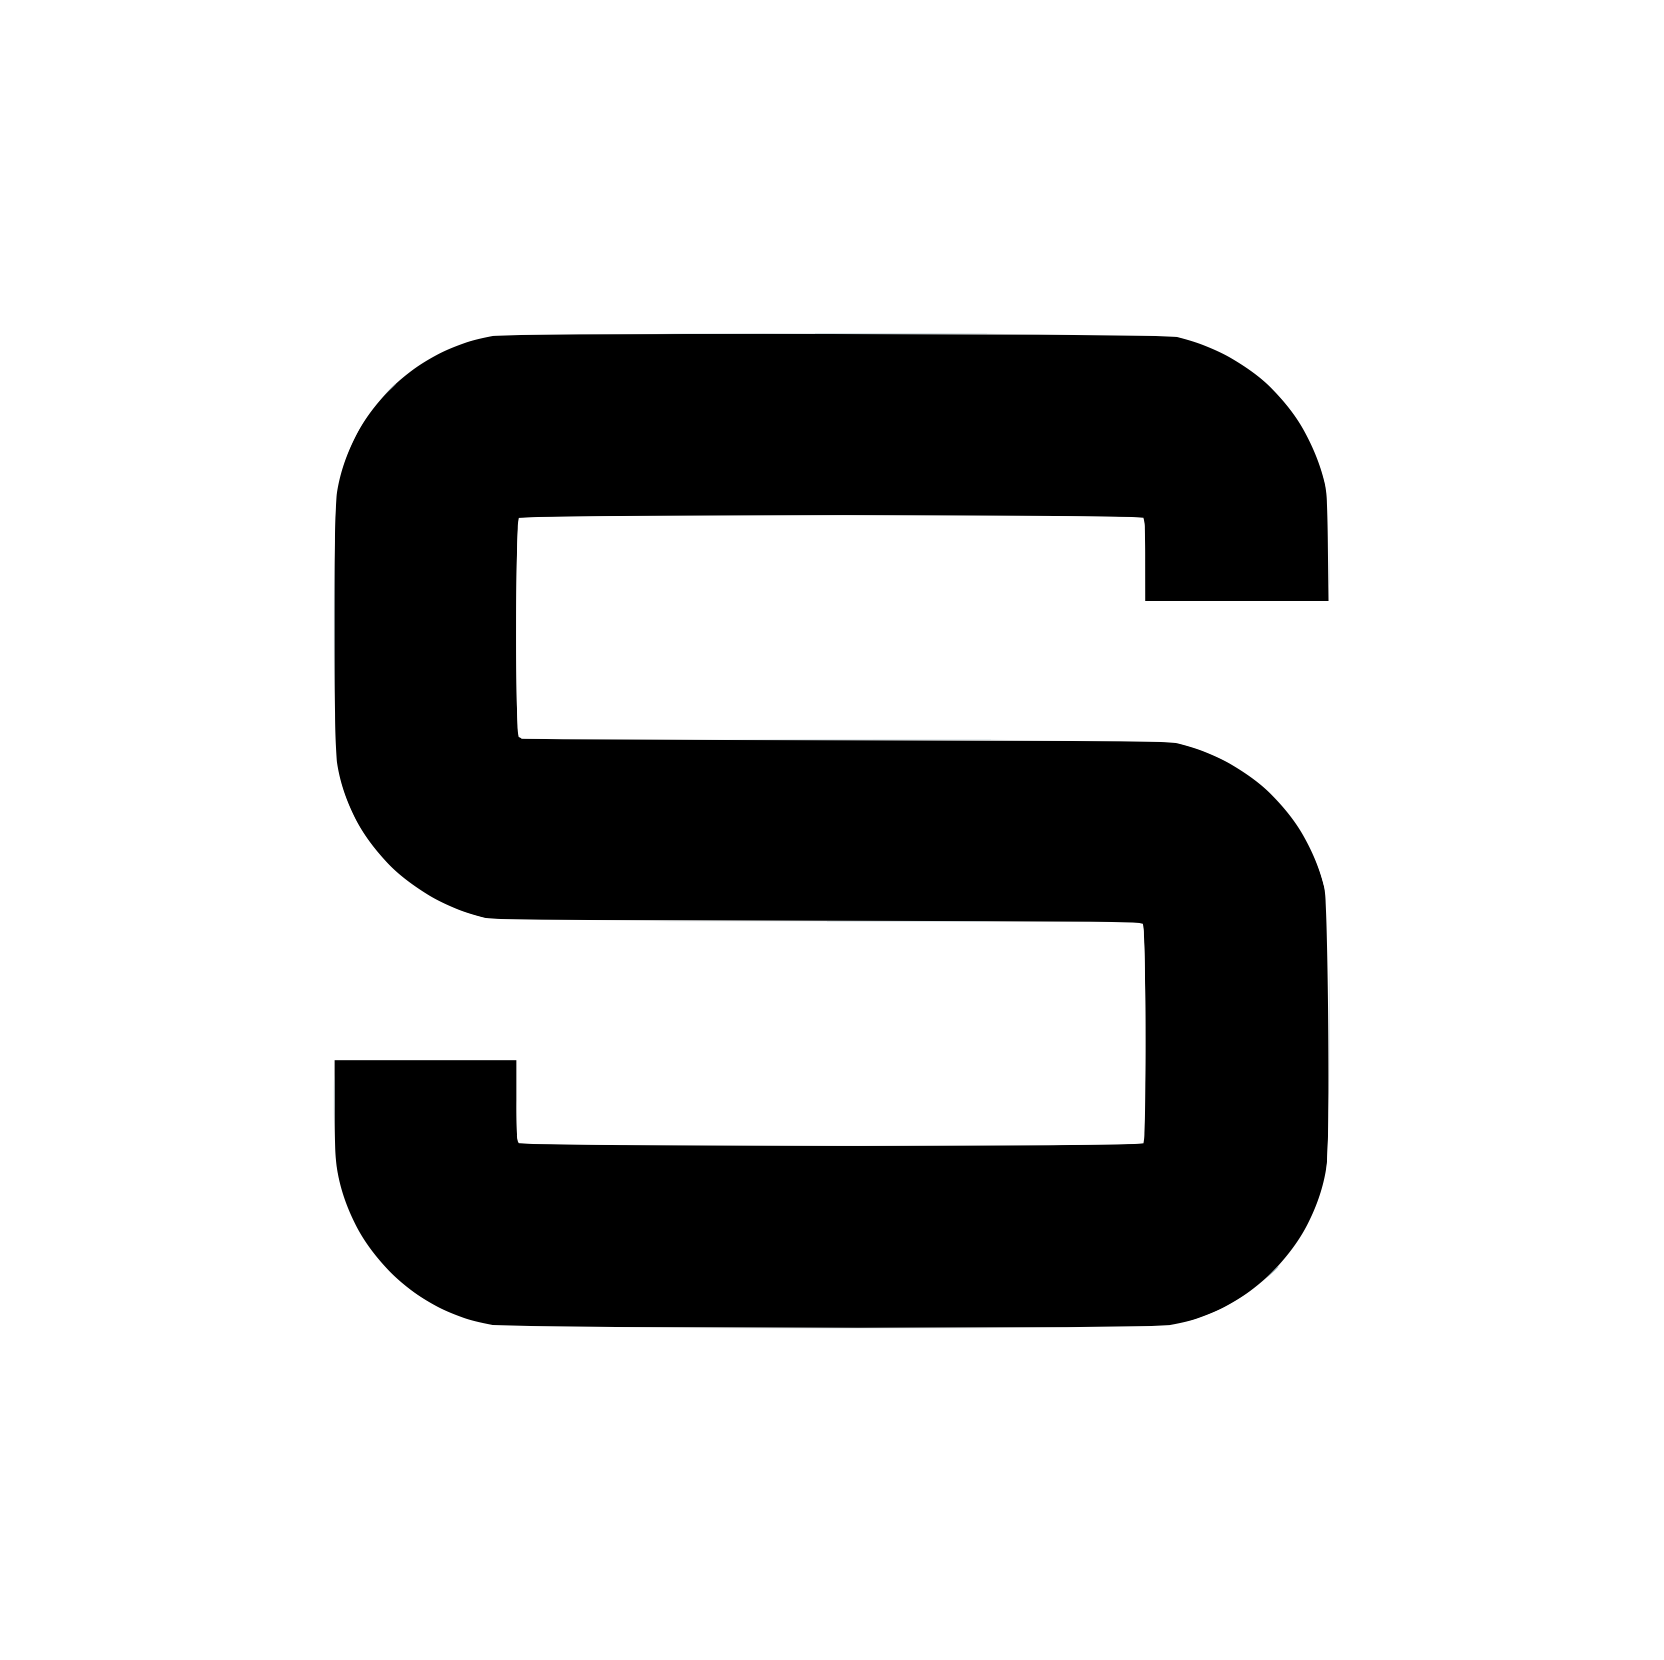 Smartex.ai